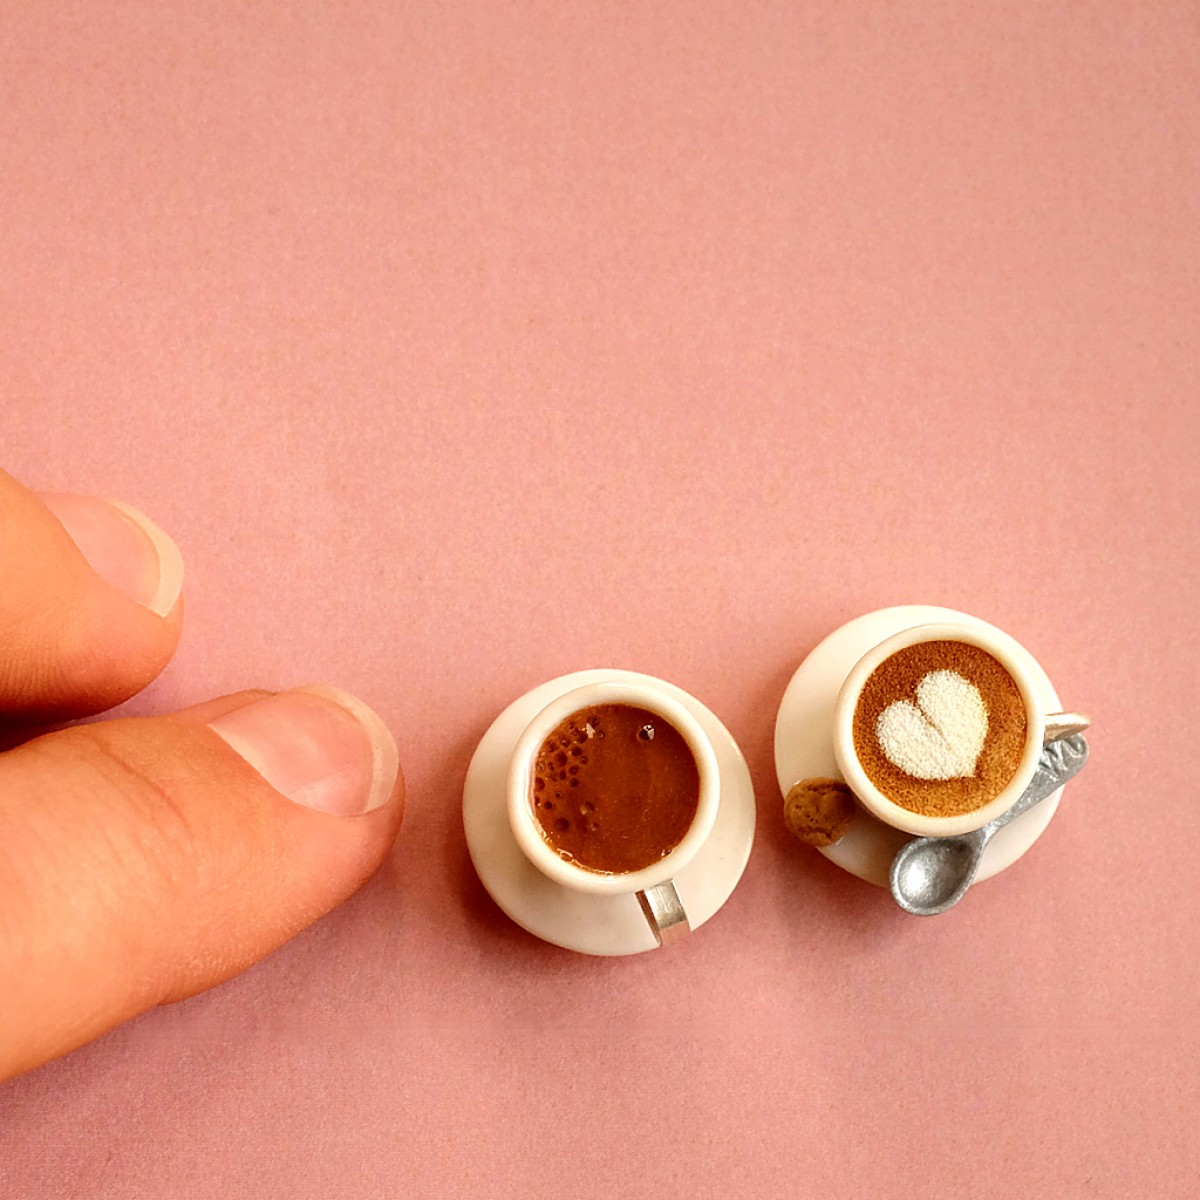 minischmidt miniCAFE Kaffeetasse klein